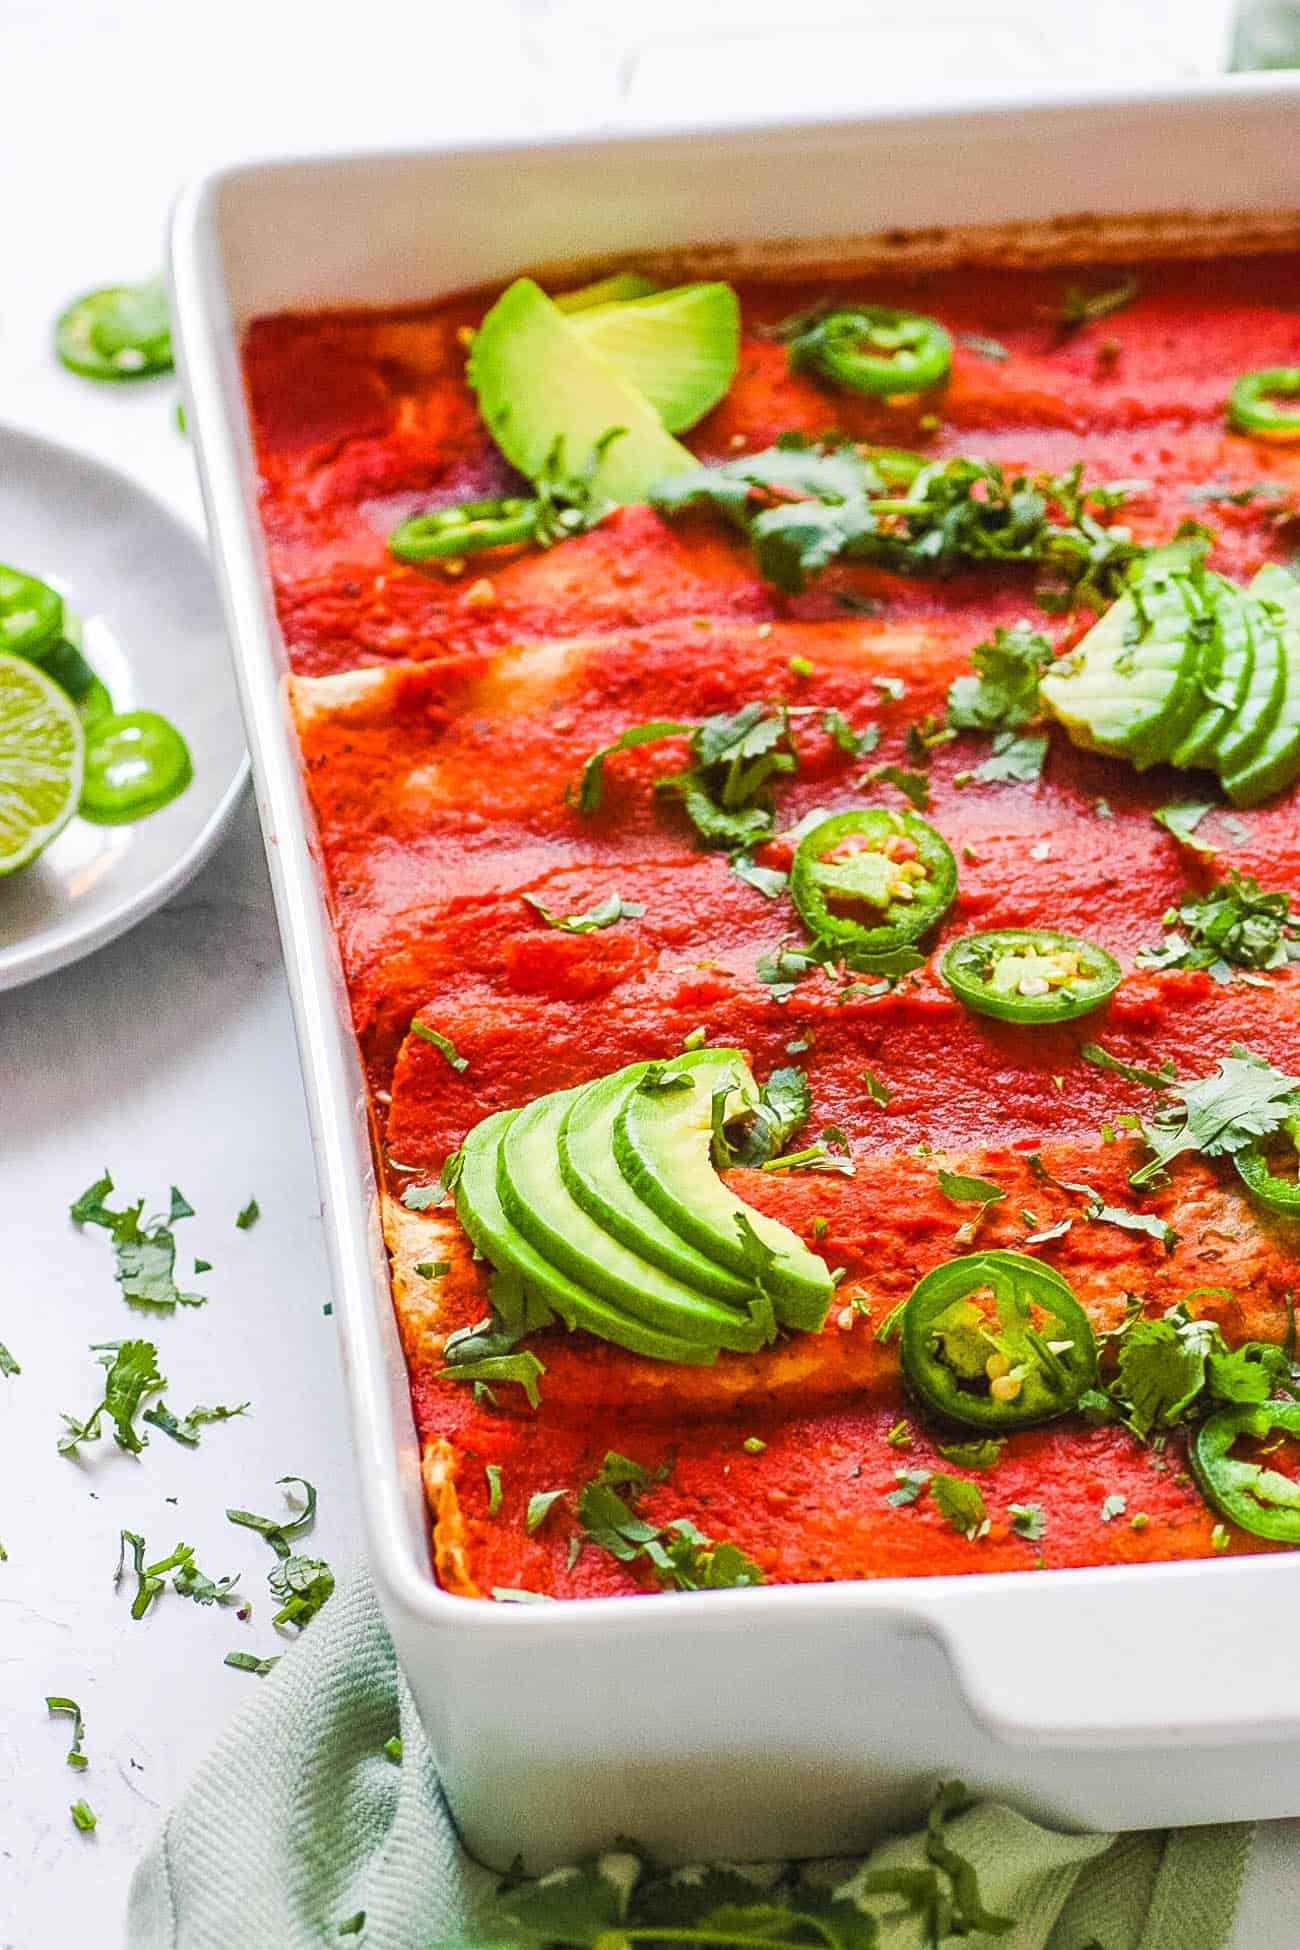 easy healthy vegan enchilada casserole recipe topped with avocado and jalapeno